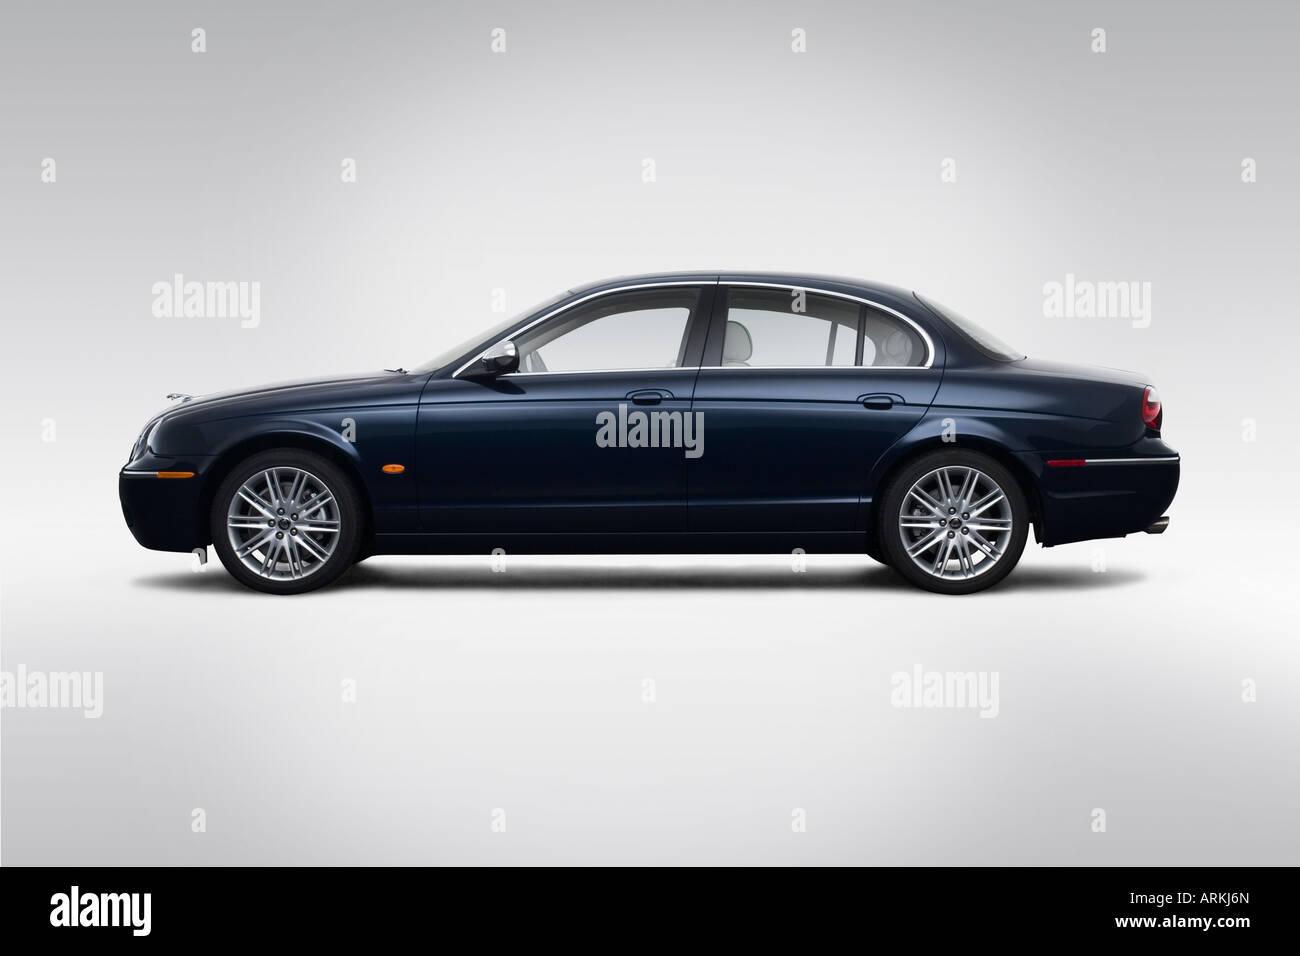 2008 Jaguar S Type 3 Em Azul   Drivers Perfil Lateral